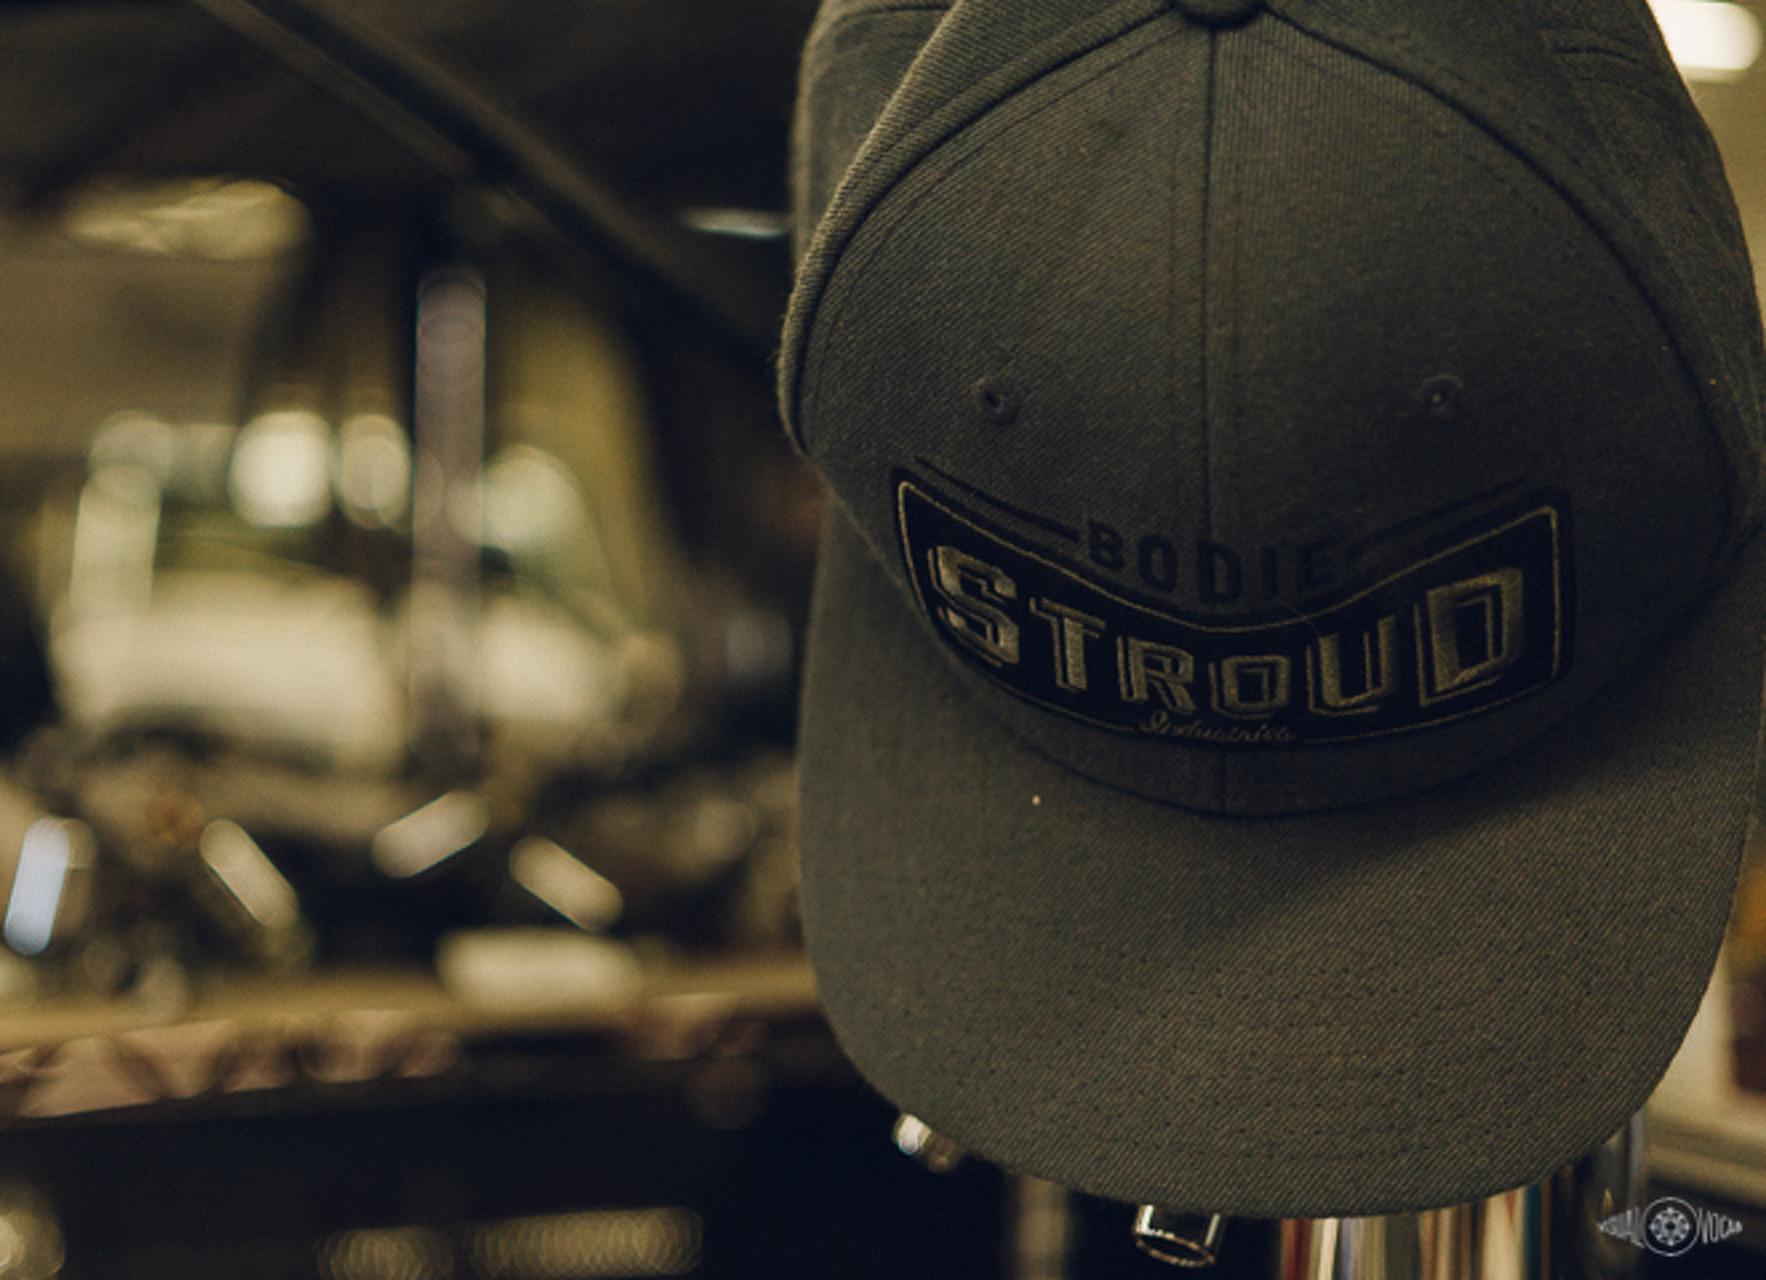 Inside Bodie Stroud Industries: A Taste is All You Need